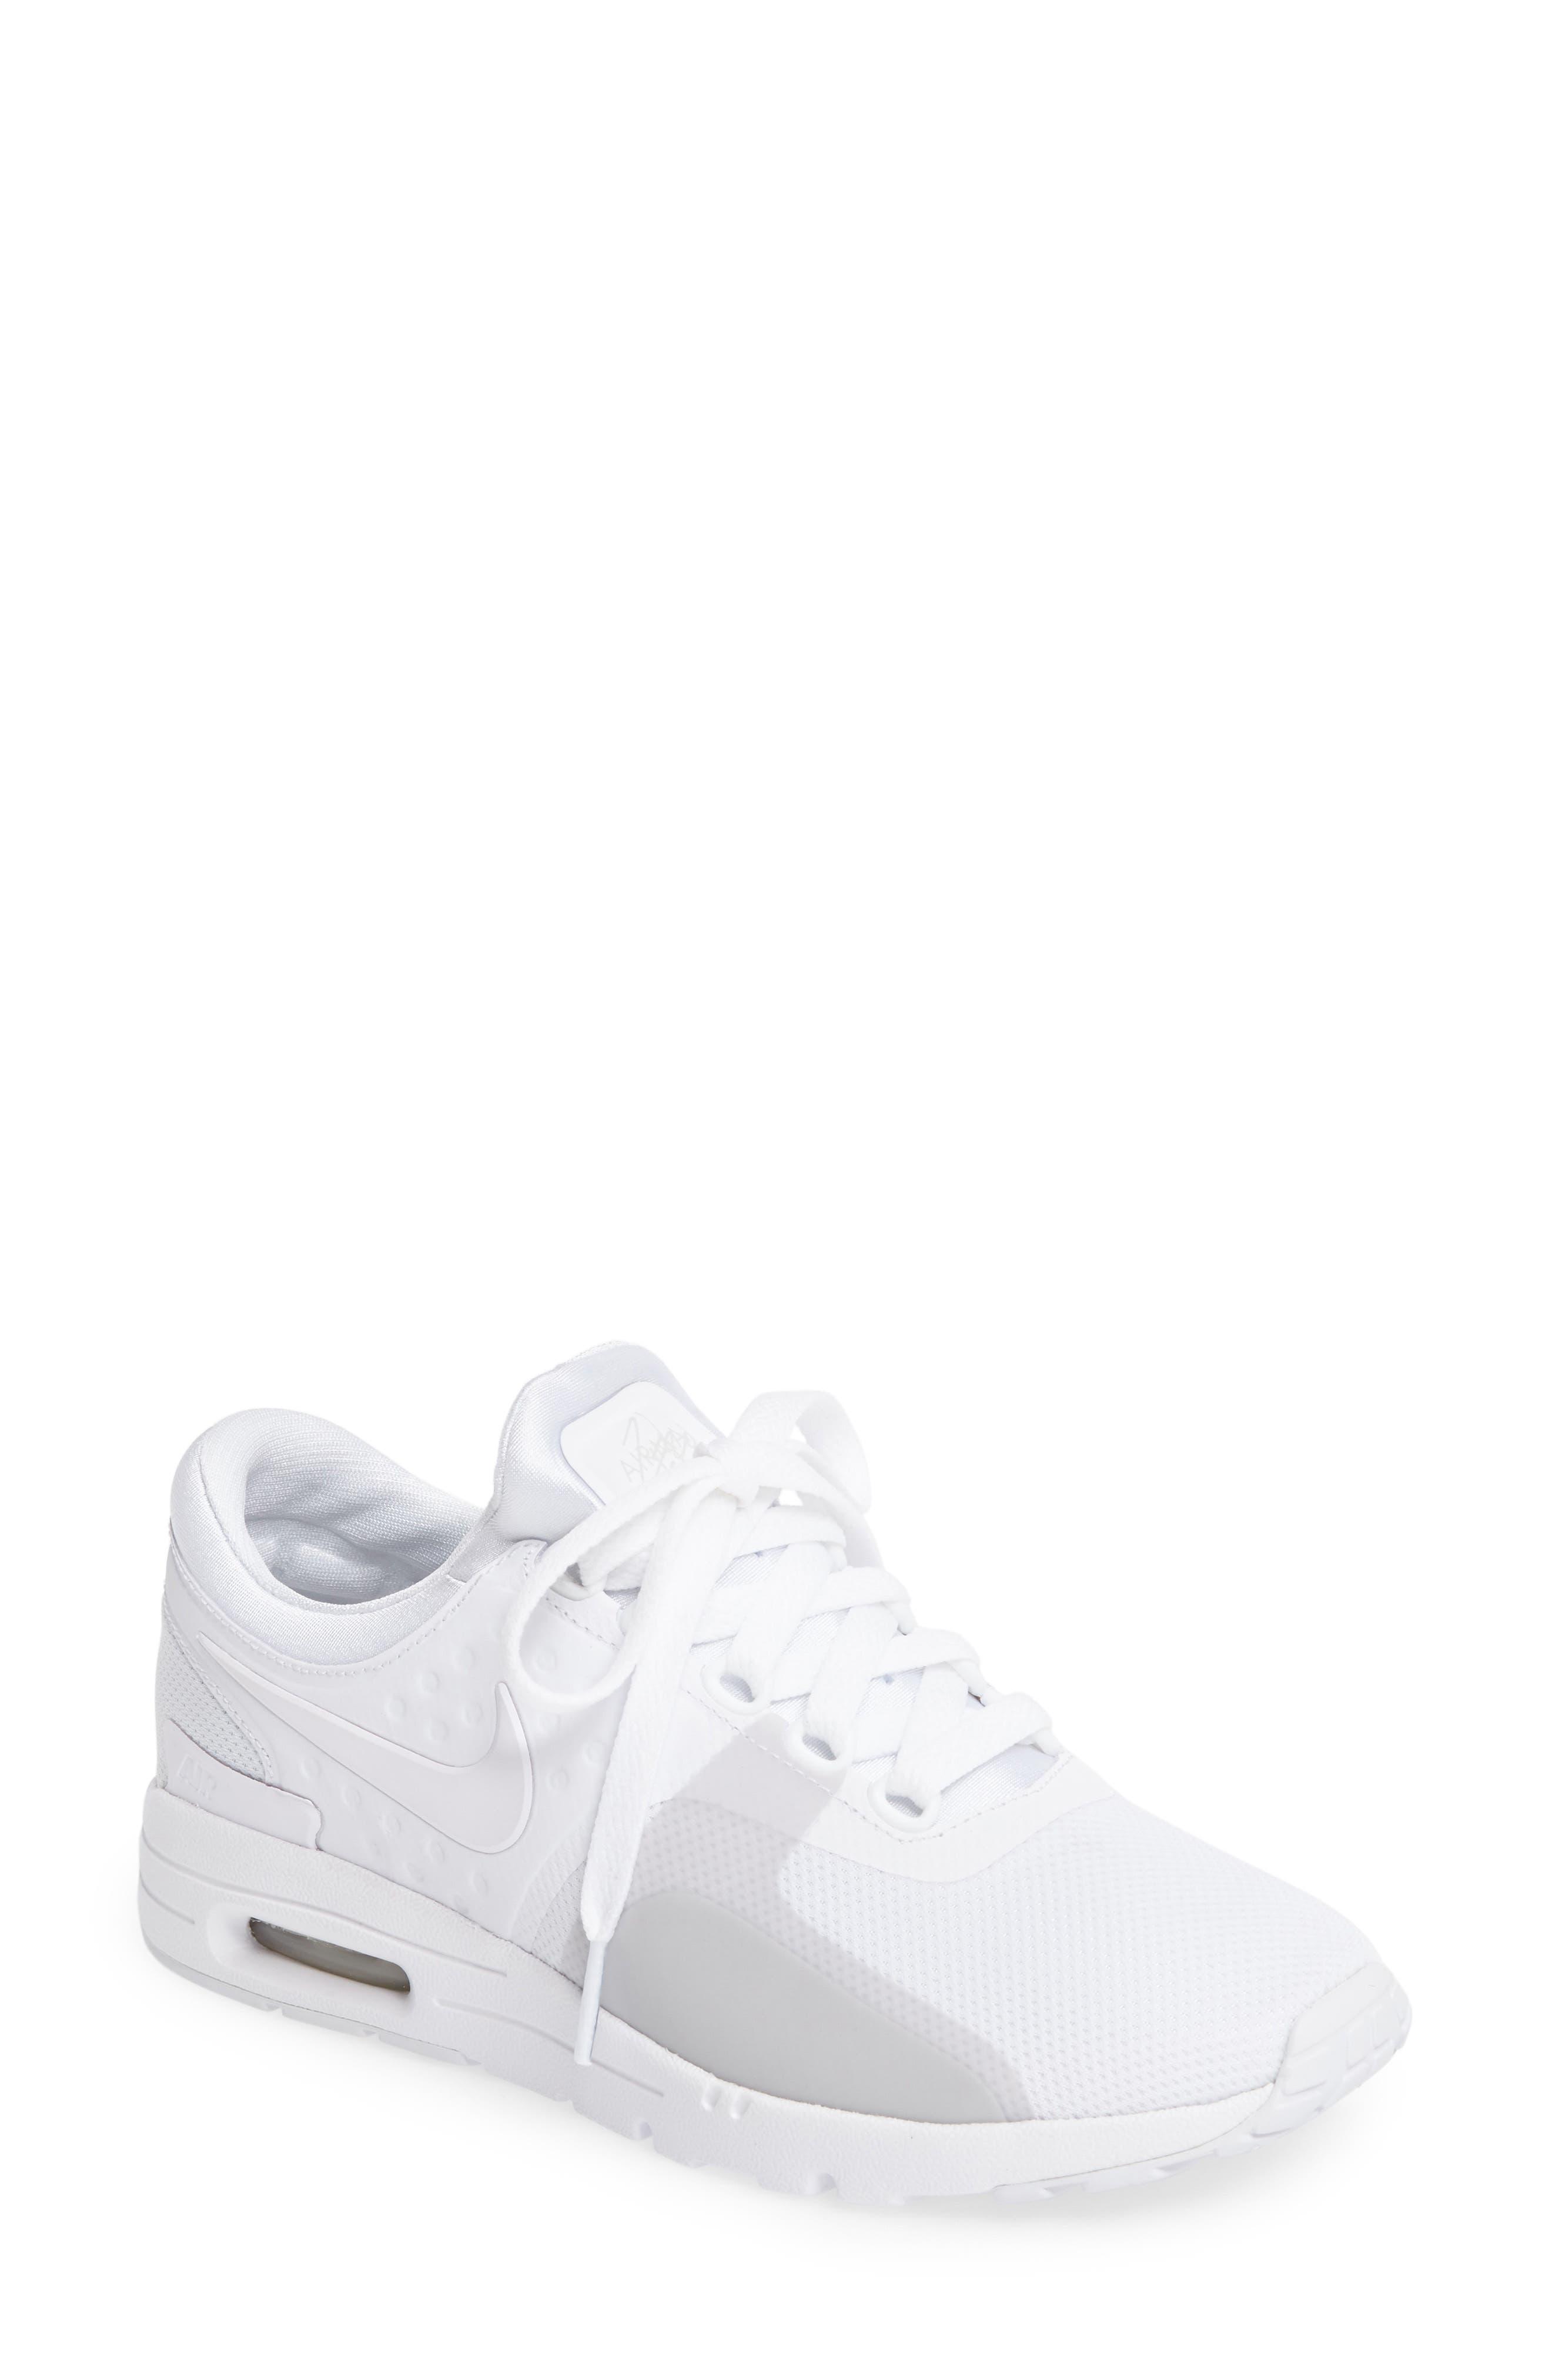 Main Image - Nike Air Max Zero Sneaker (Women)